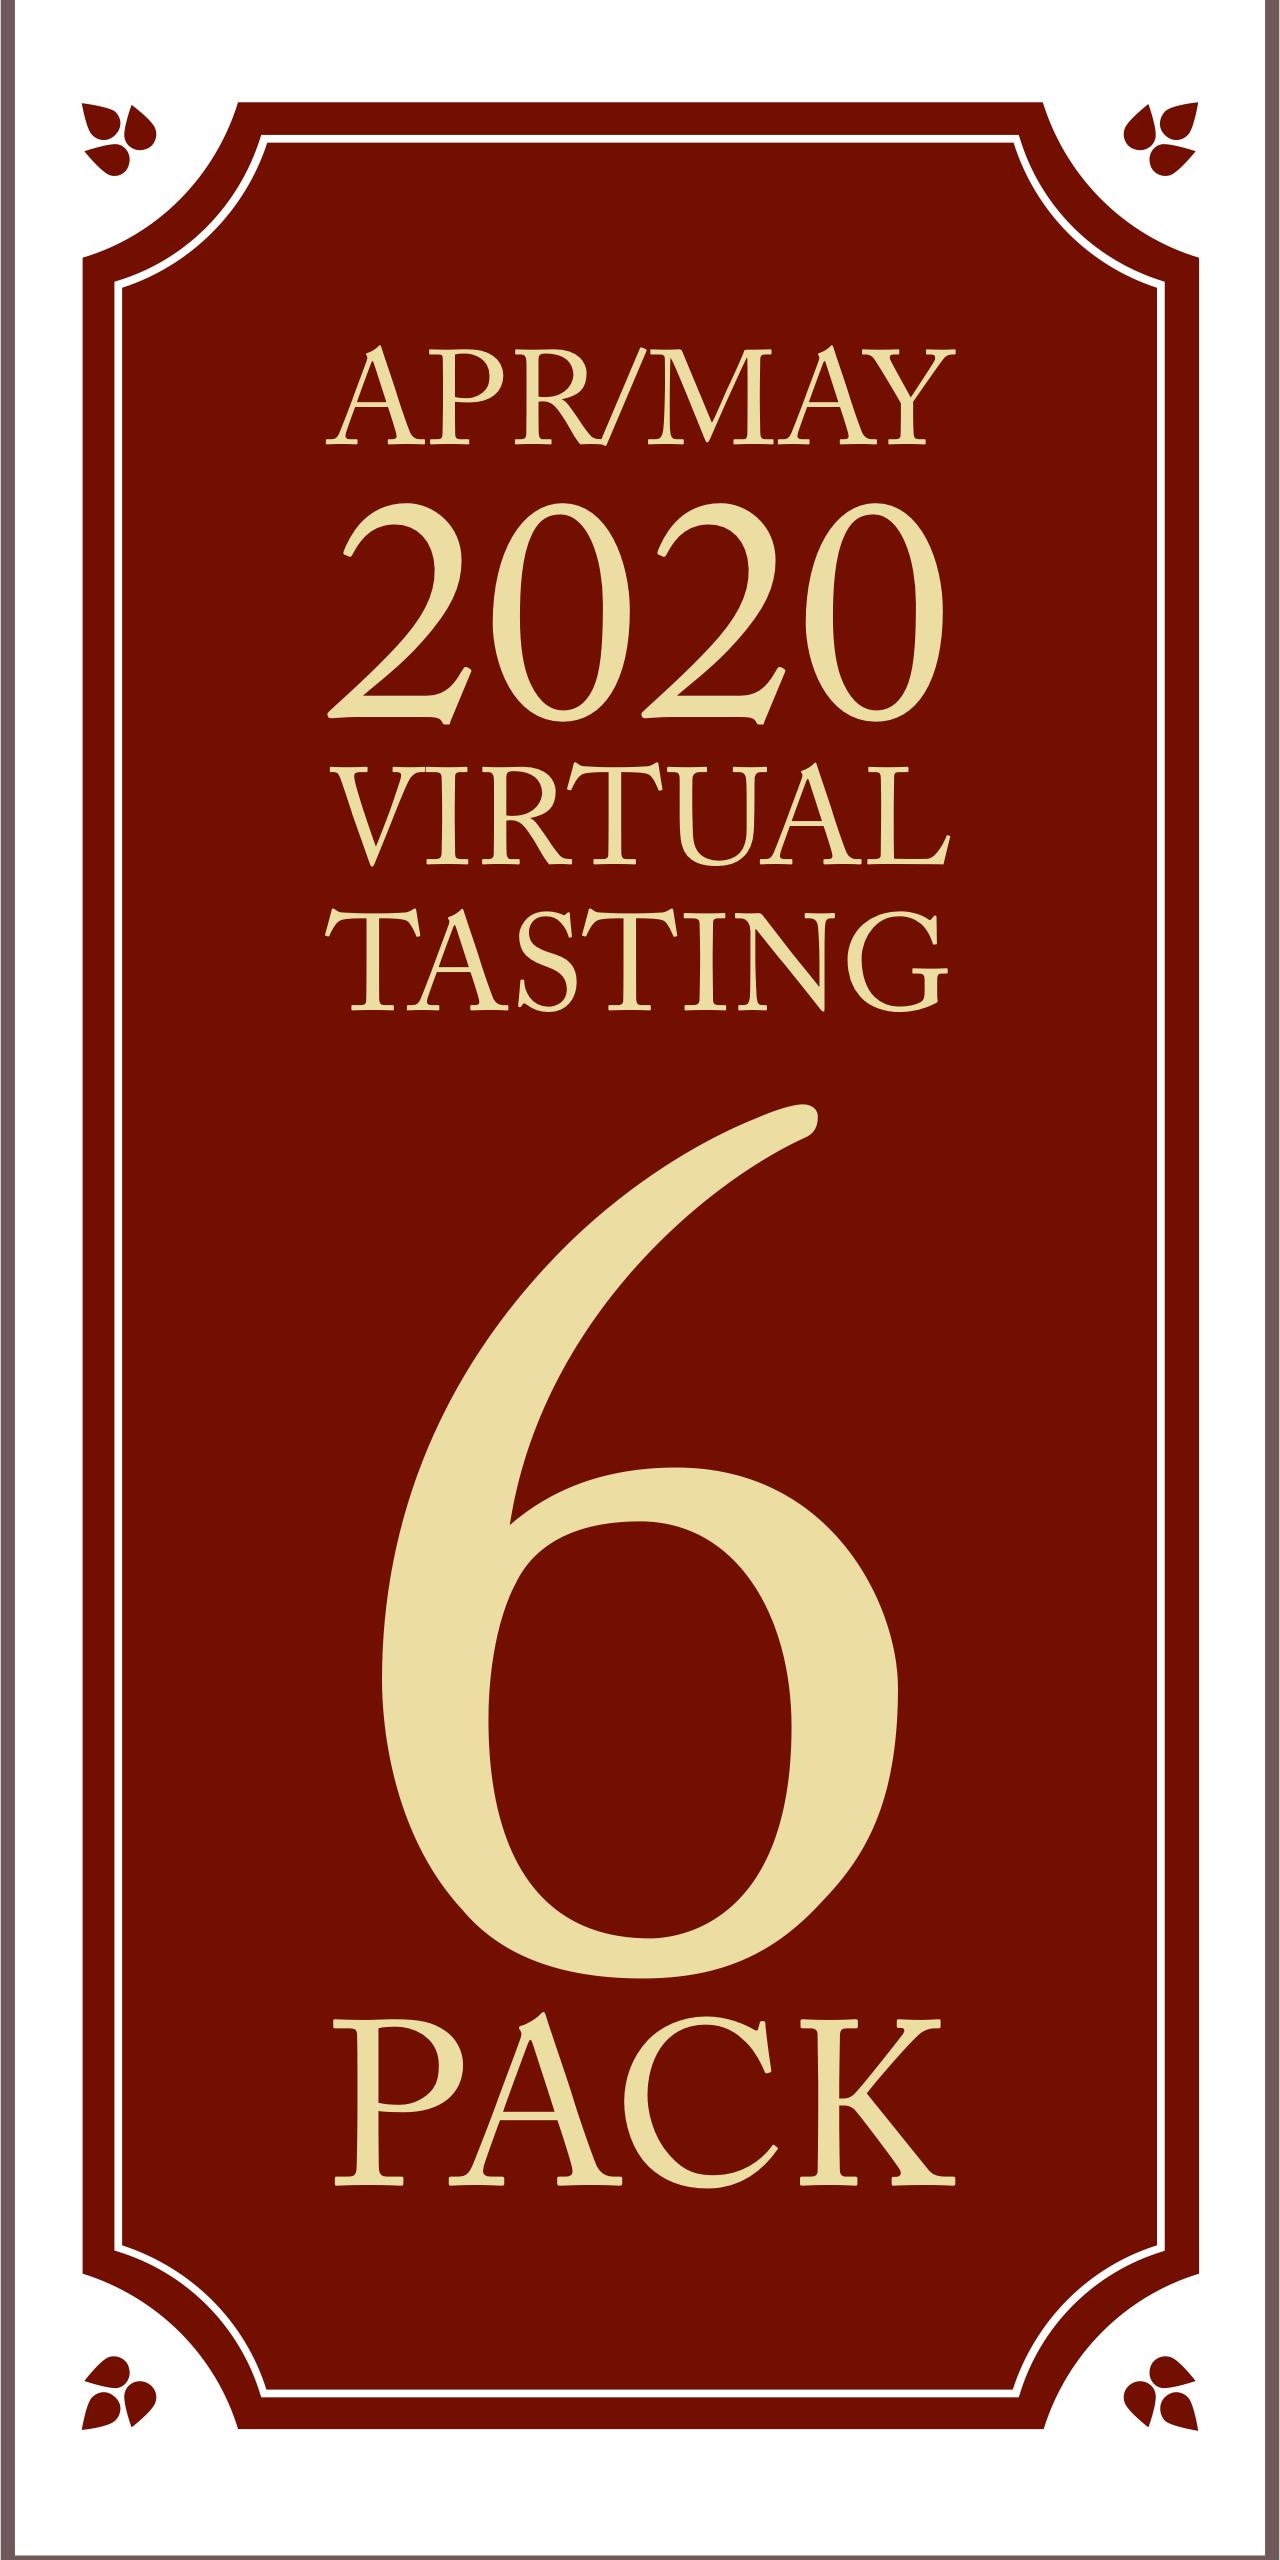 April/May 2020 Virtual Tasting 6 pack #2 (6x750ml)